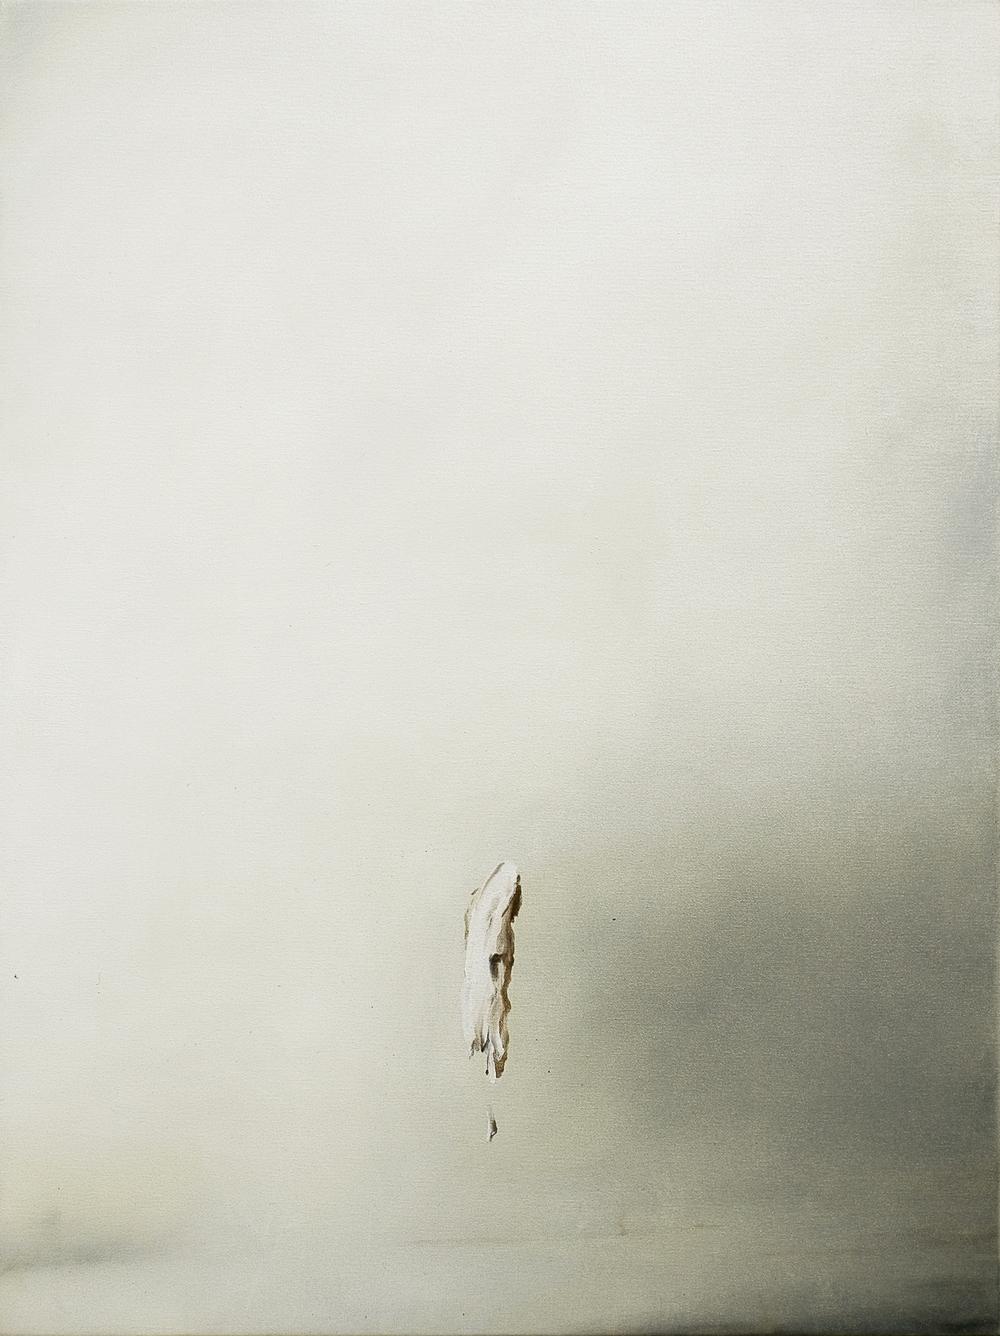 Thomas Riess, blur, 100x75cm, Öl auf Leinwand, 2015